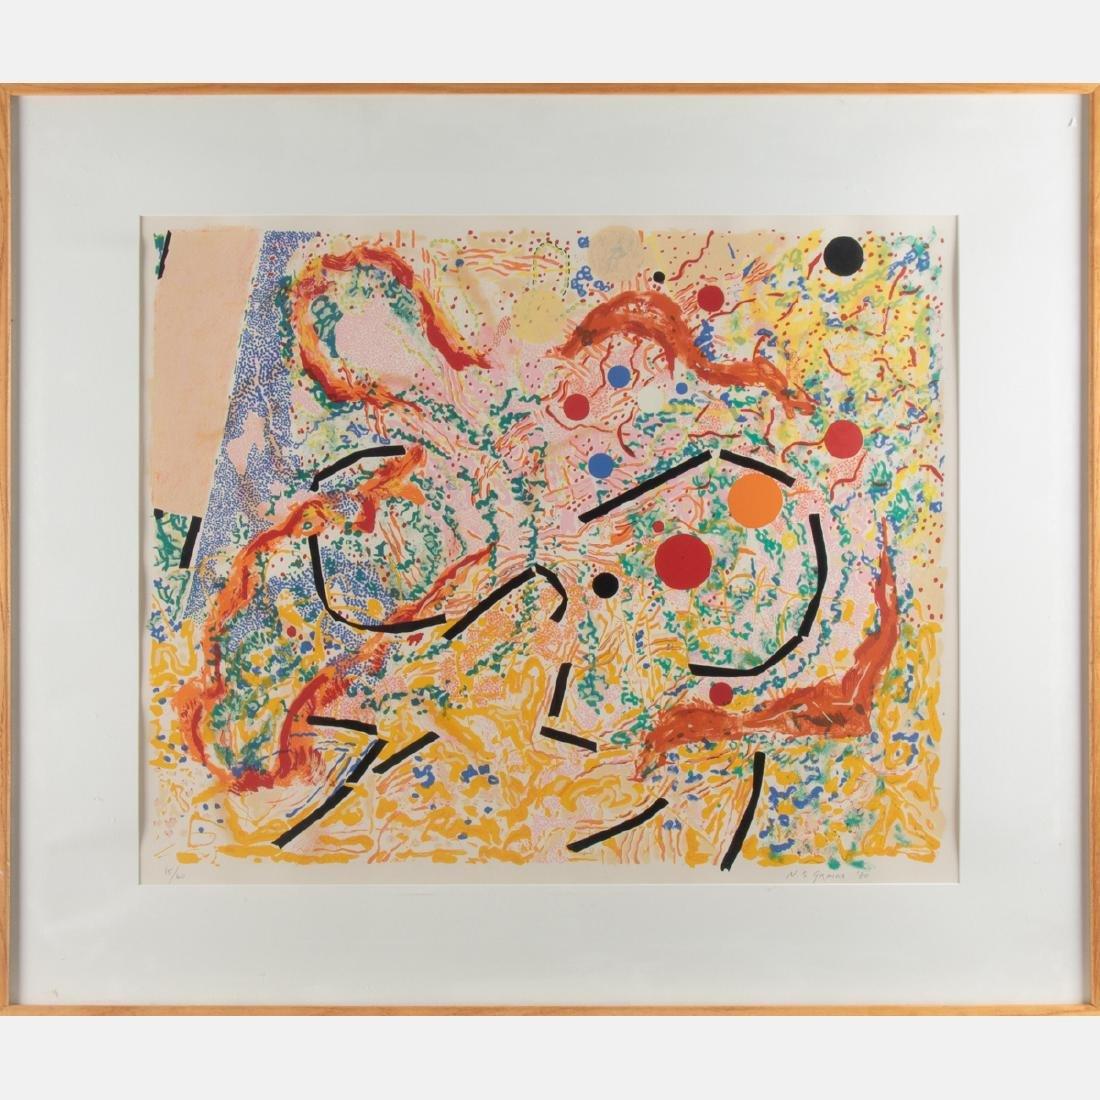 Nancy Stevenson Graves (1940-1995) Vertigo, 1980, - 2